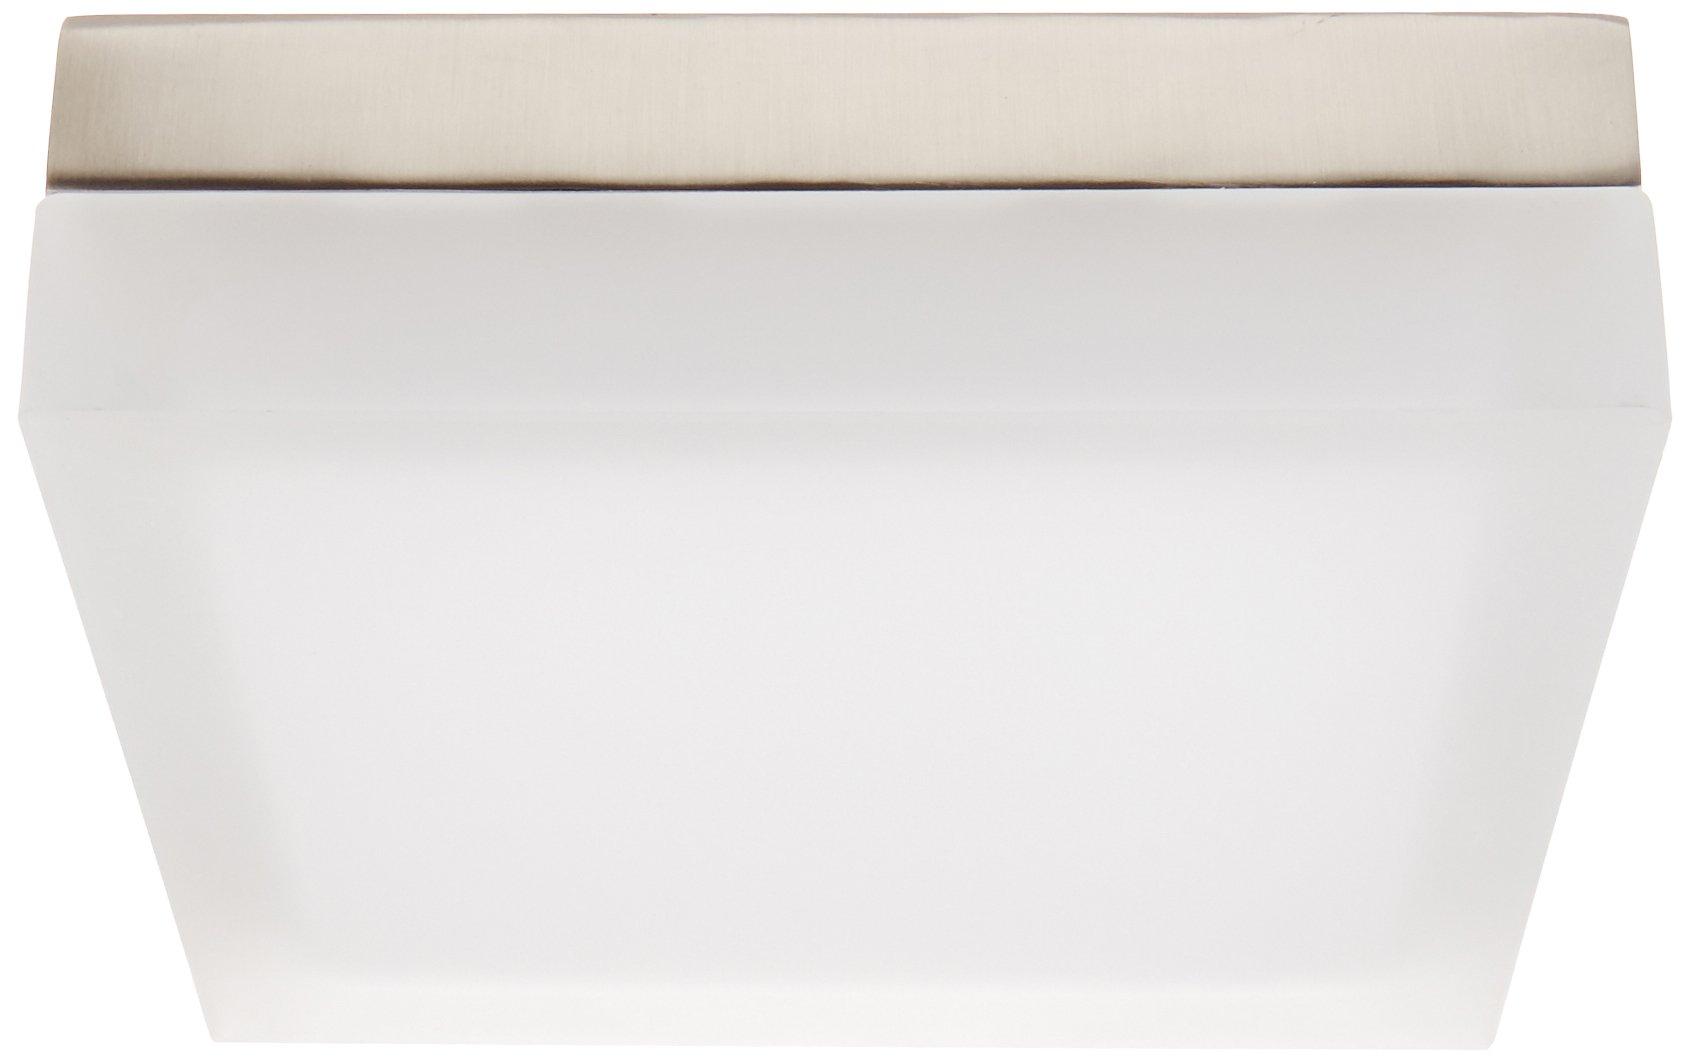 WAC Lighting FM-4009-30-BN 9in Square Soft White